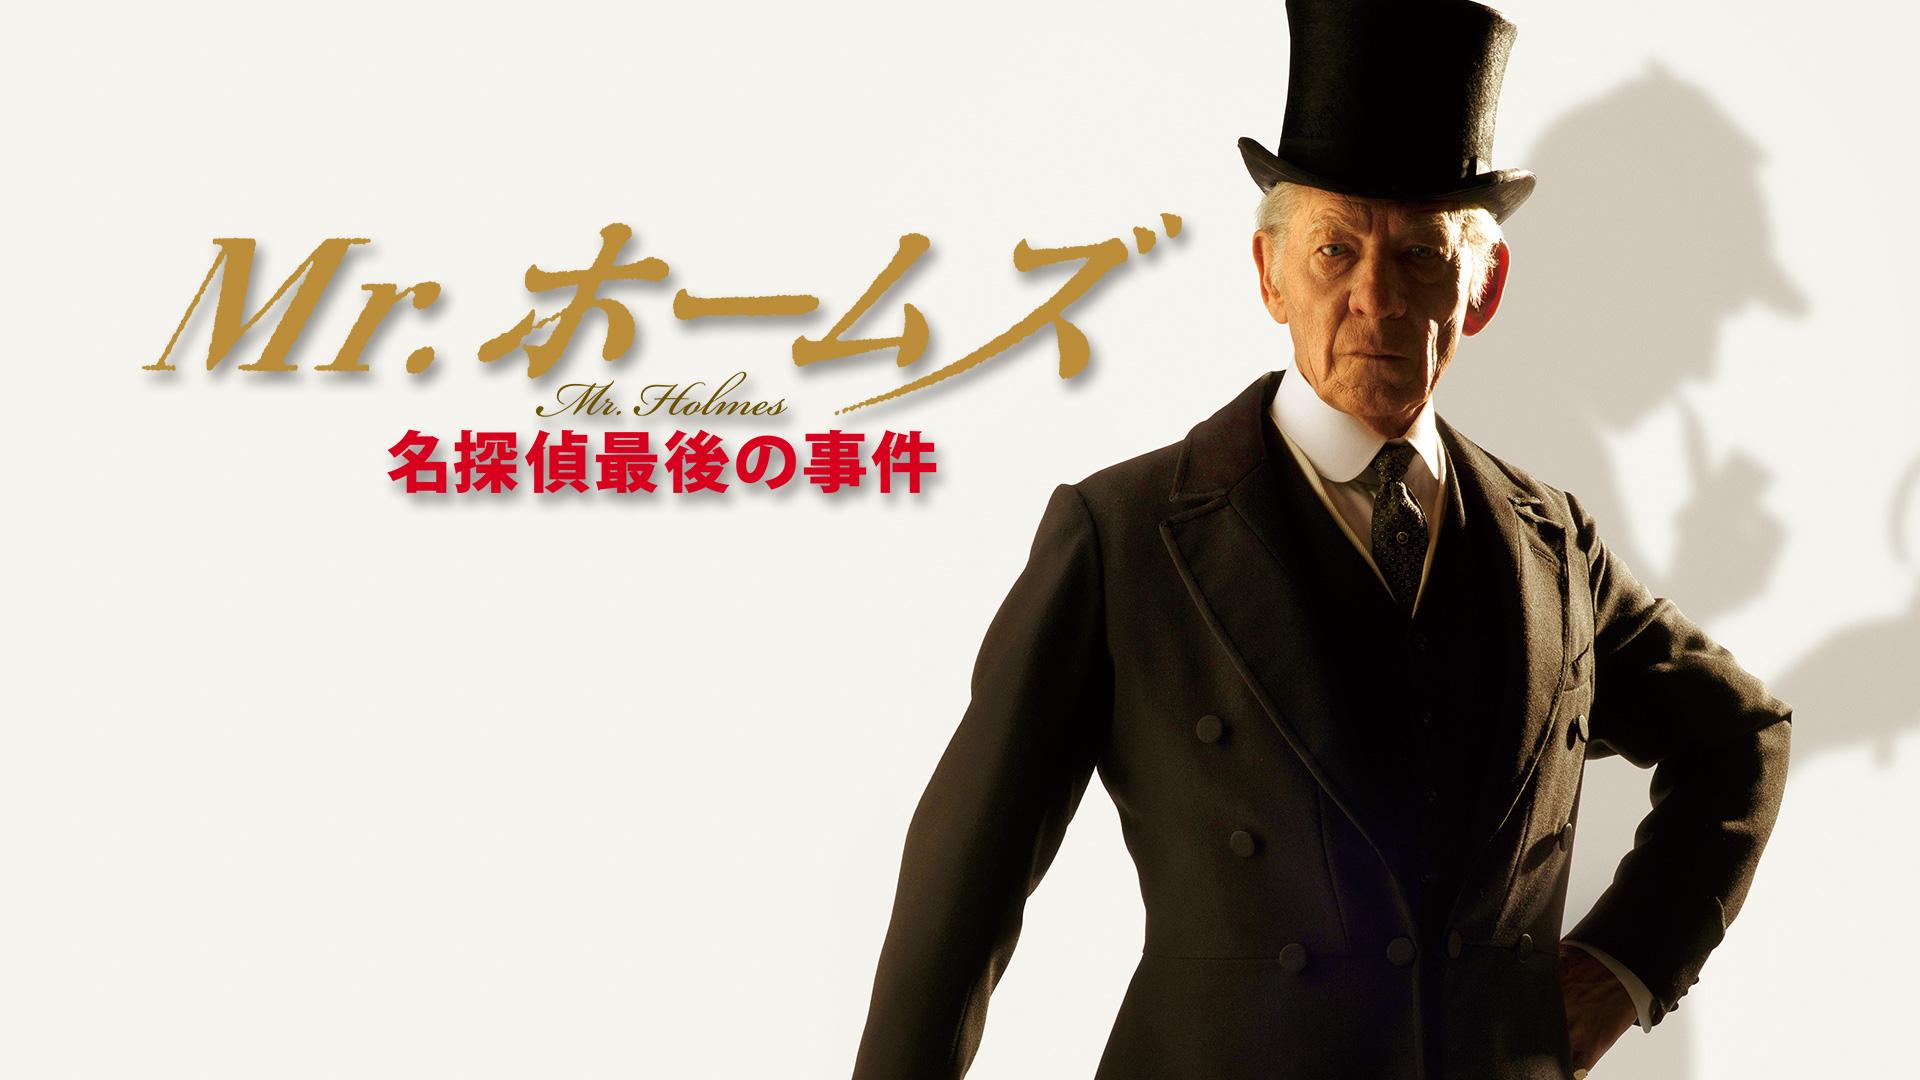 Mr.ホームズ 名探偵最後の事件(字幕版)